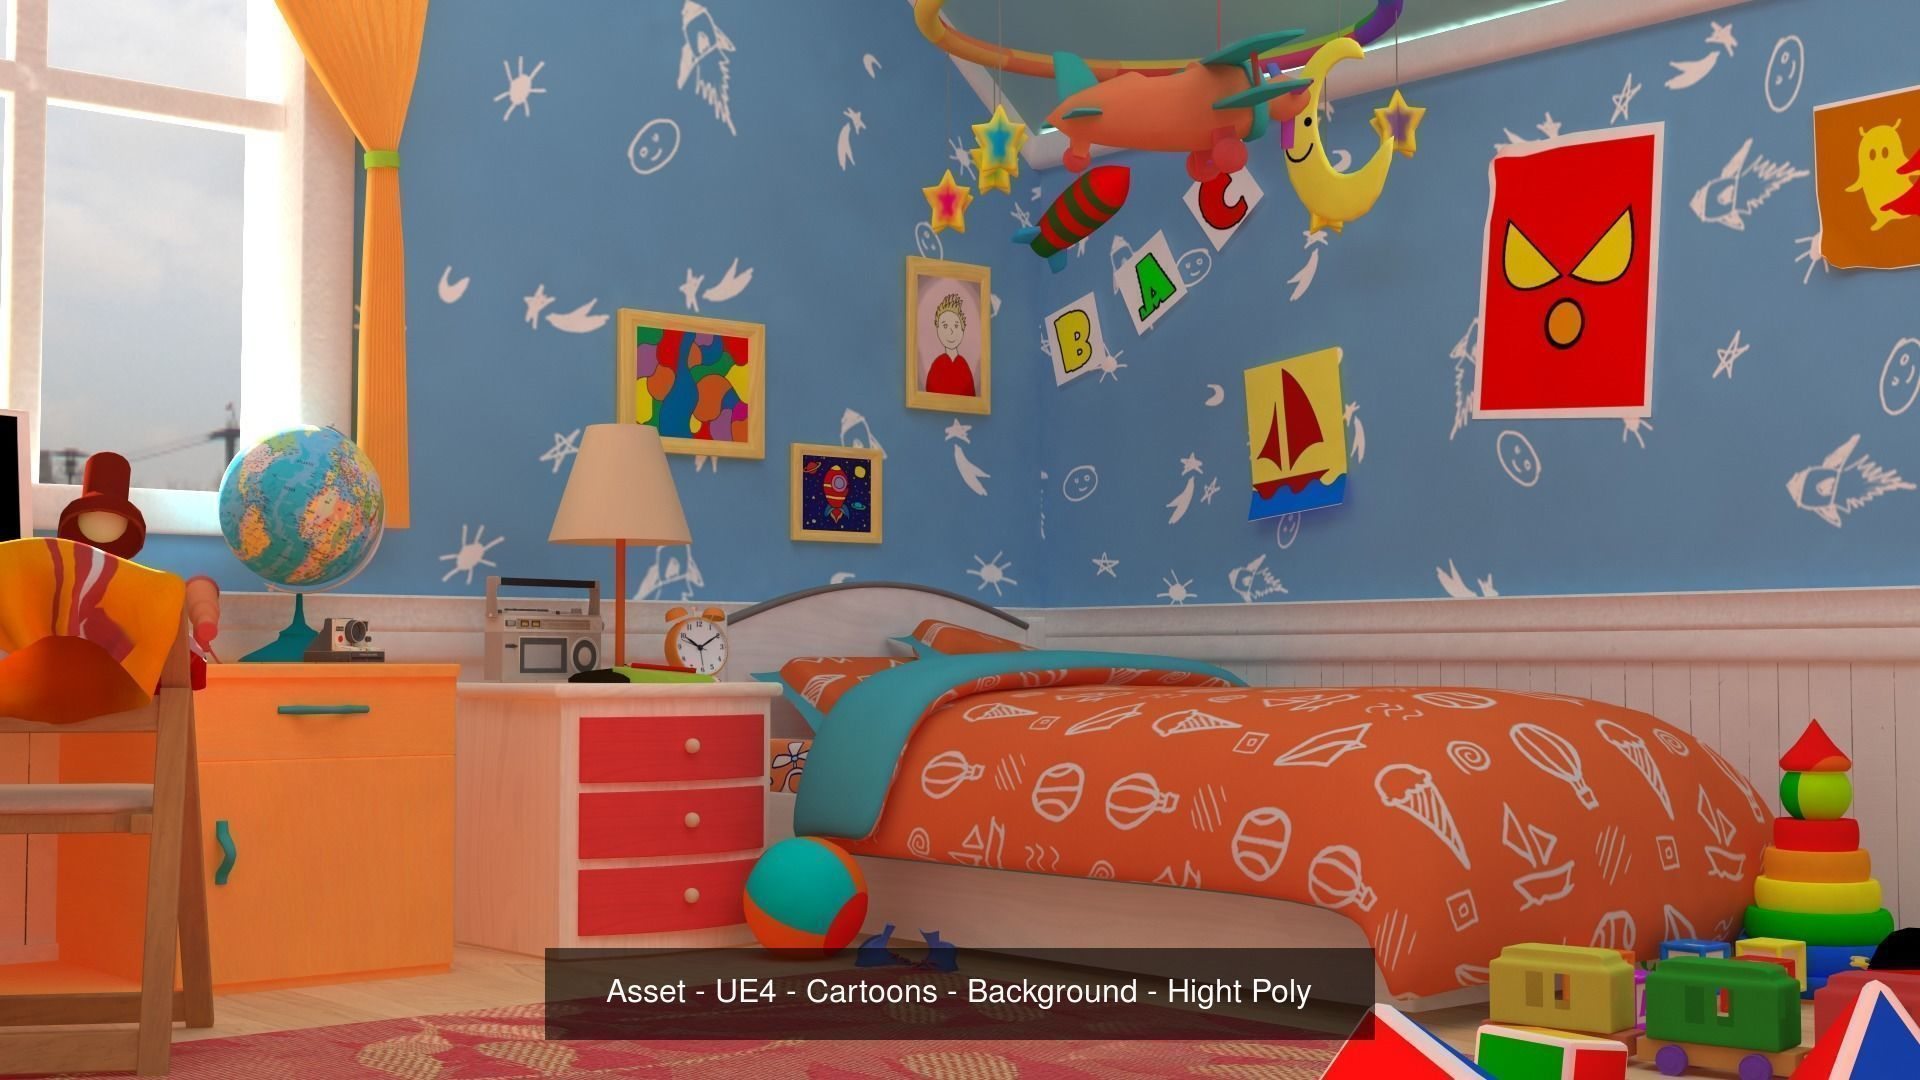 Asset - Cartoons - Background 04 - Hight Poly